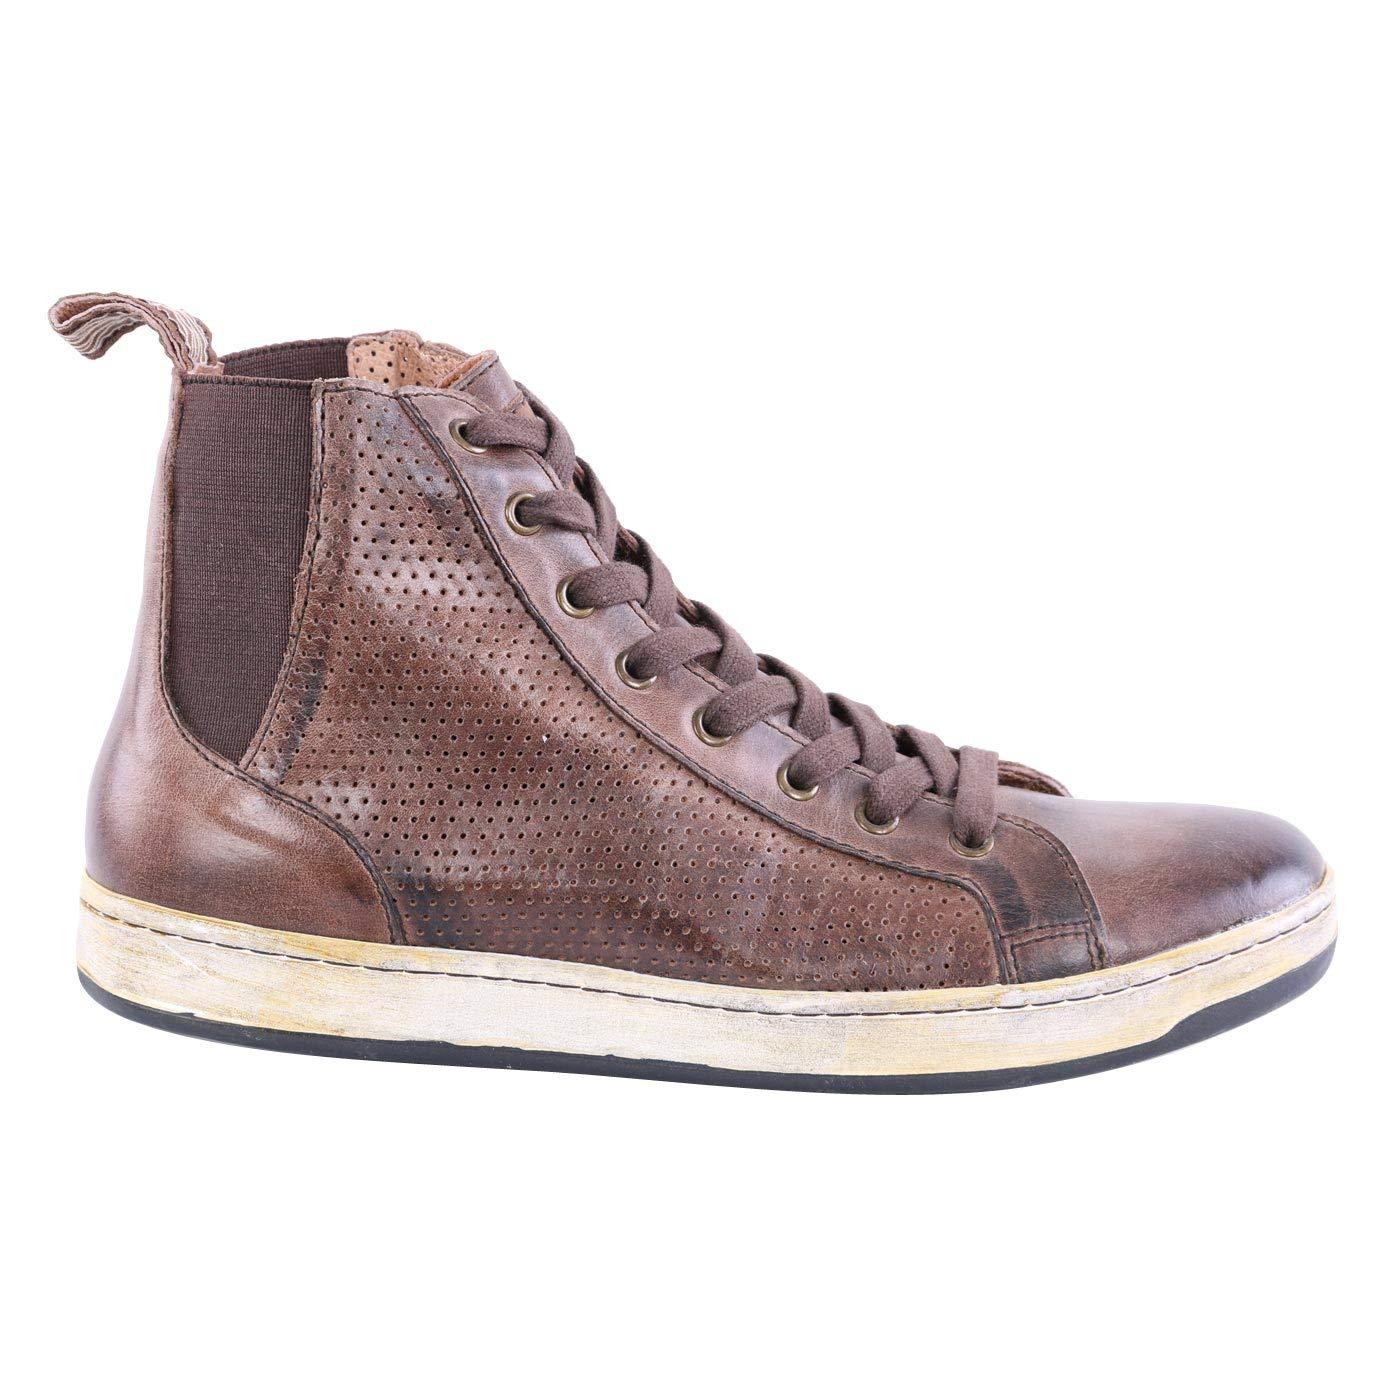 Matchless Damen Leder Turnschuhe Schuhe Brighton HIGH Vent braun 142021 Größe 37